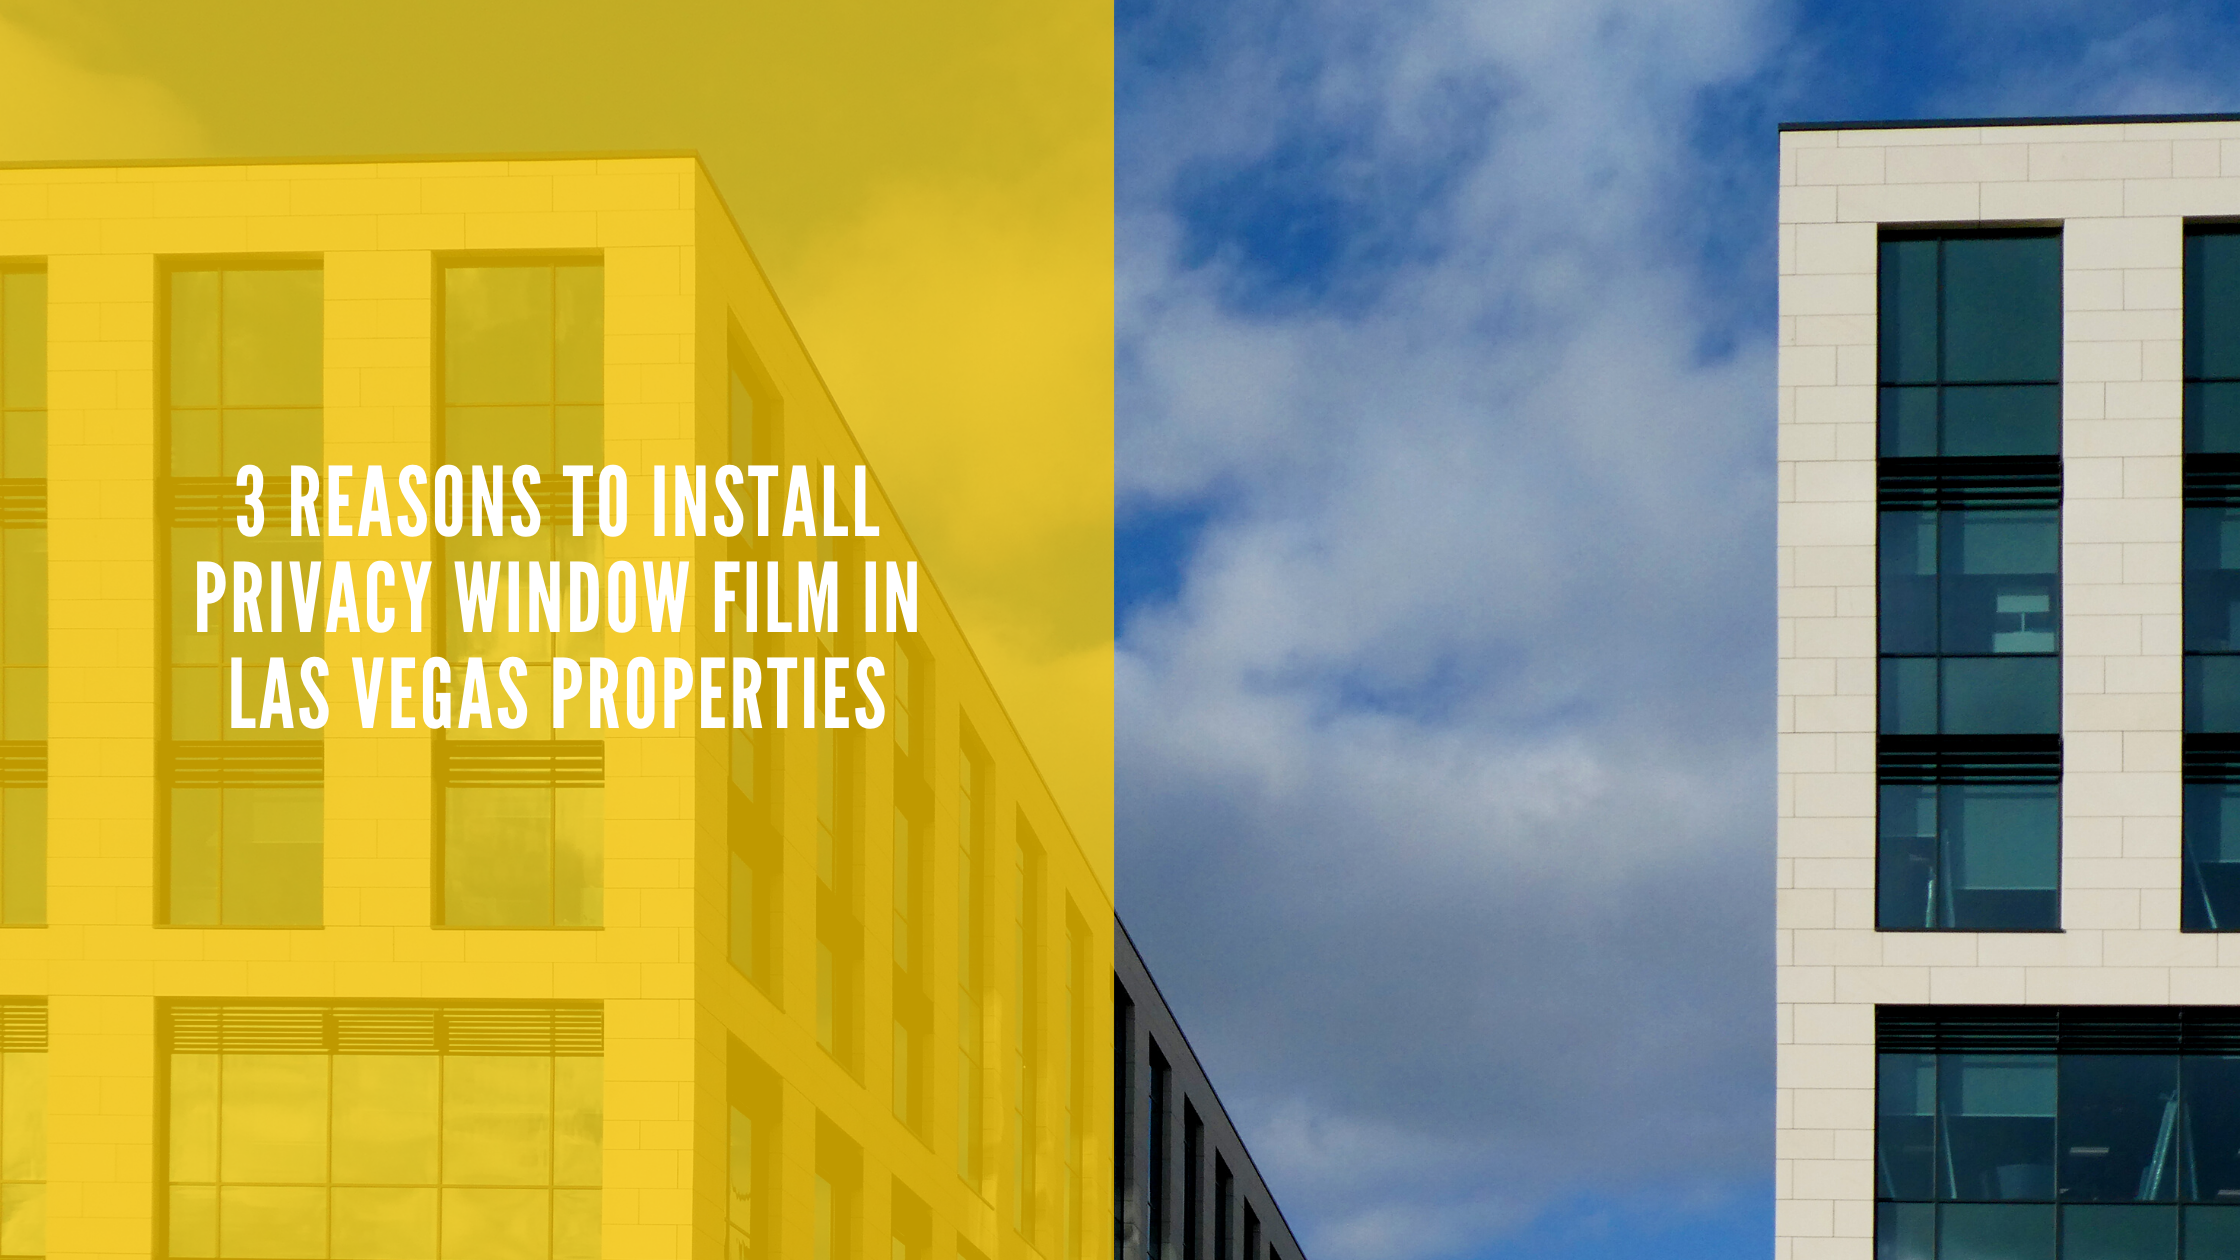 3 Reasons to Install Privacy Window Film In Las Vegas Properties